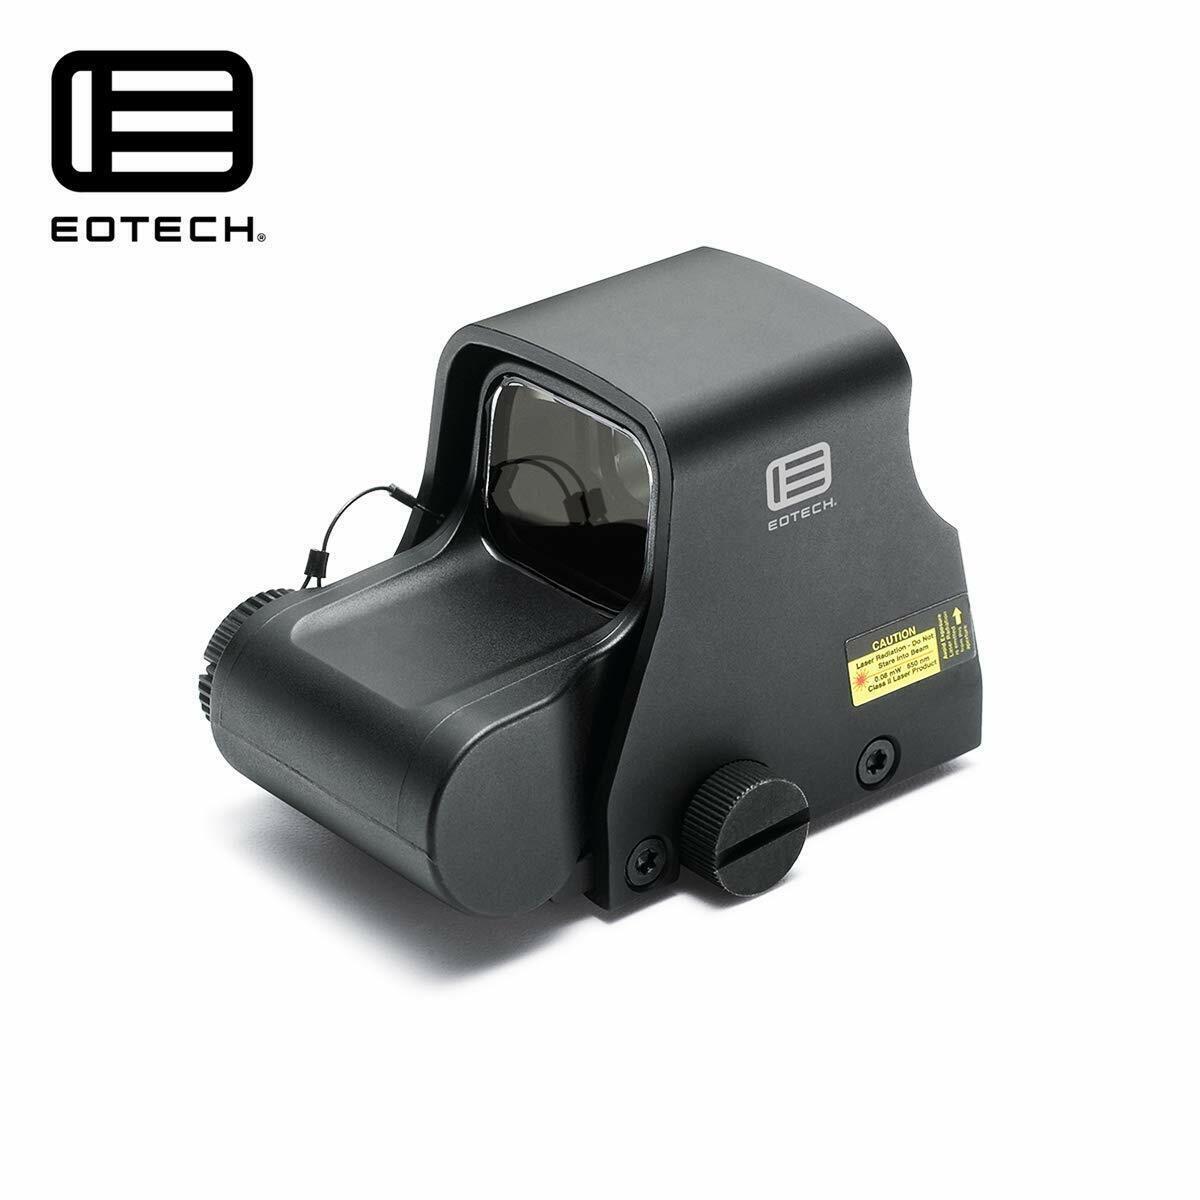 Mira Holográfica arma EOTech XPS2-2 alcance 68 Moa Círculo (2) 1 Moa ROJO Dots